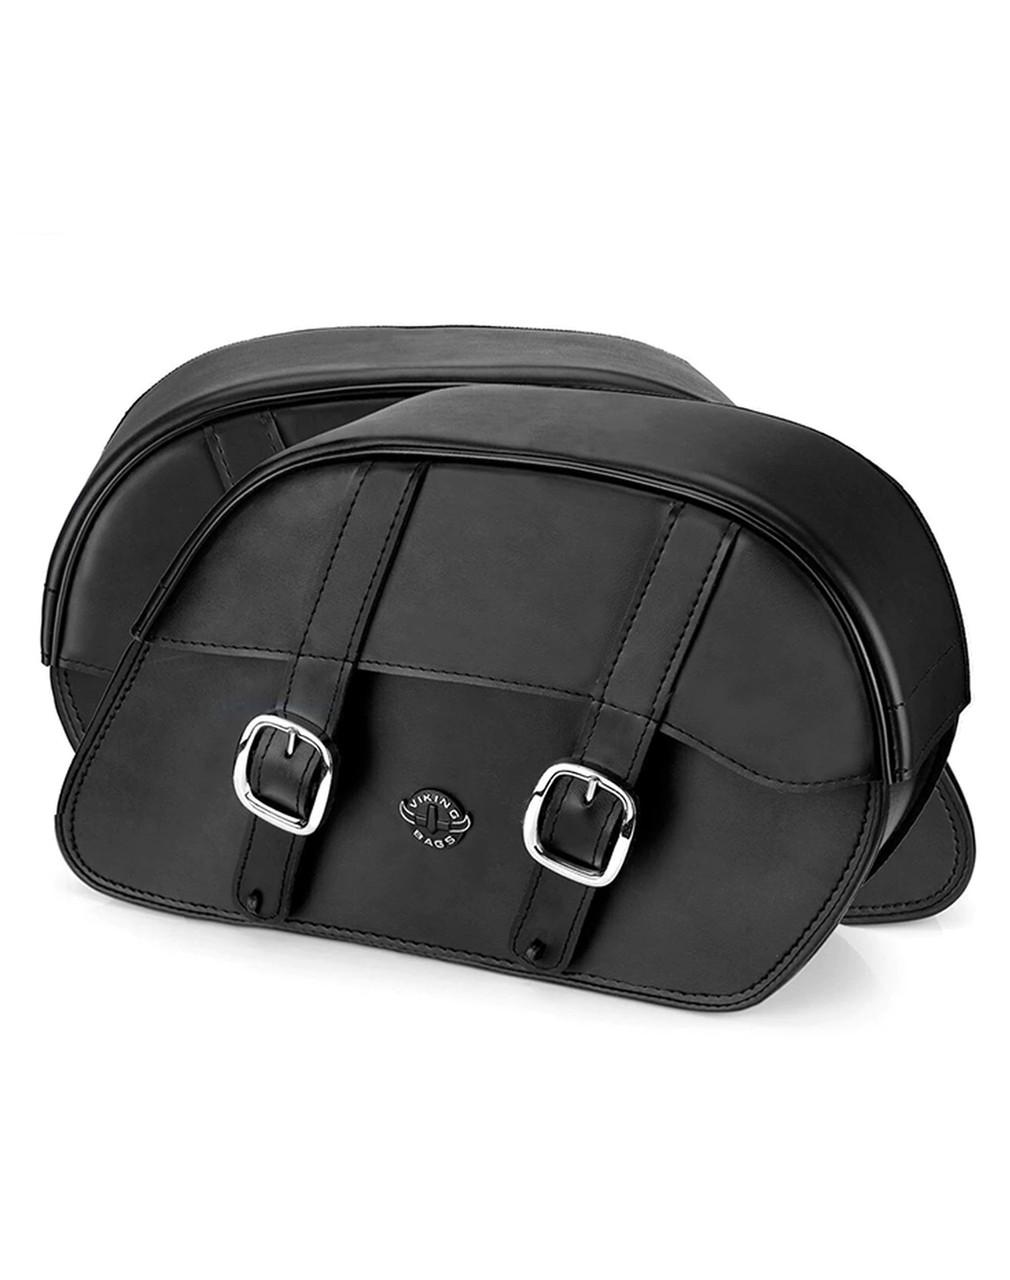 Honda 750 Shadow Aero Slant Large Motorcycle Saddlebags Both Bags View